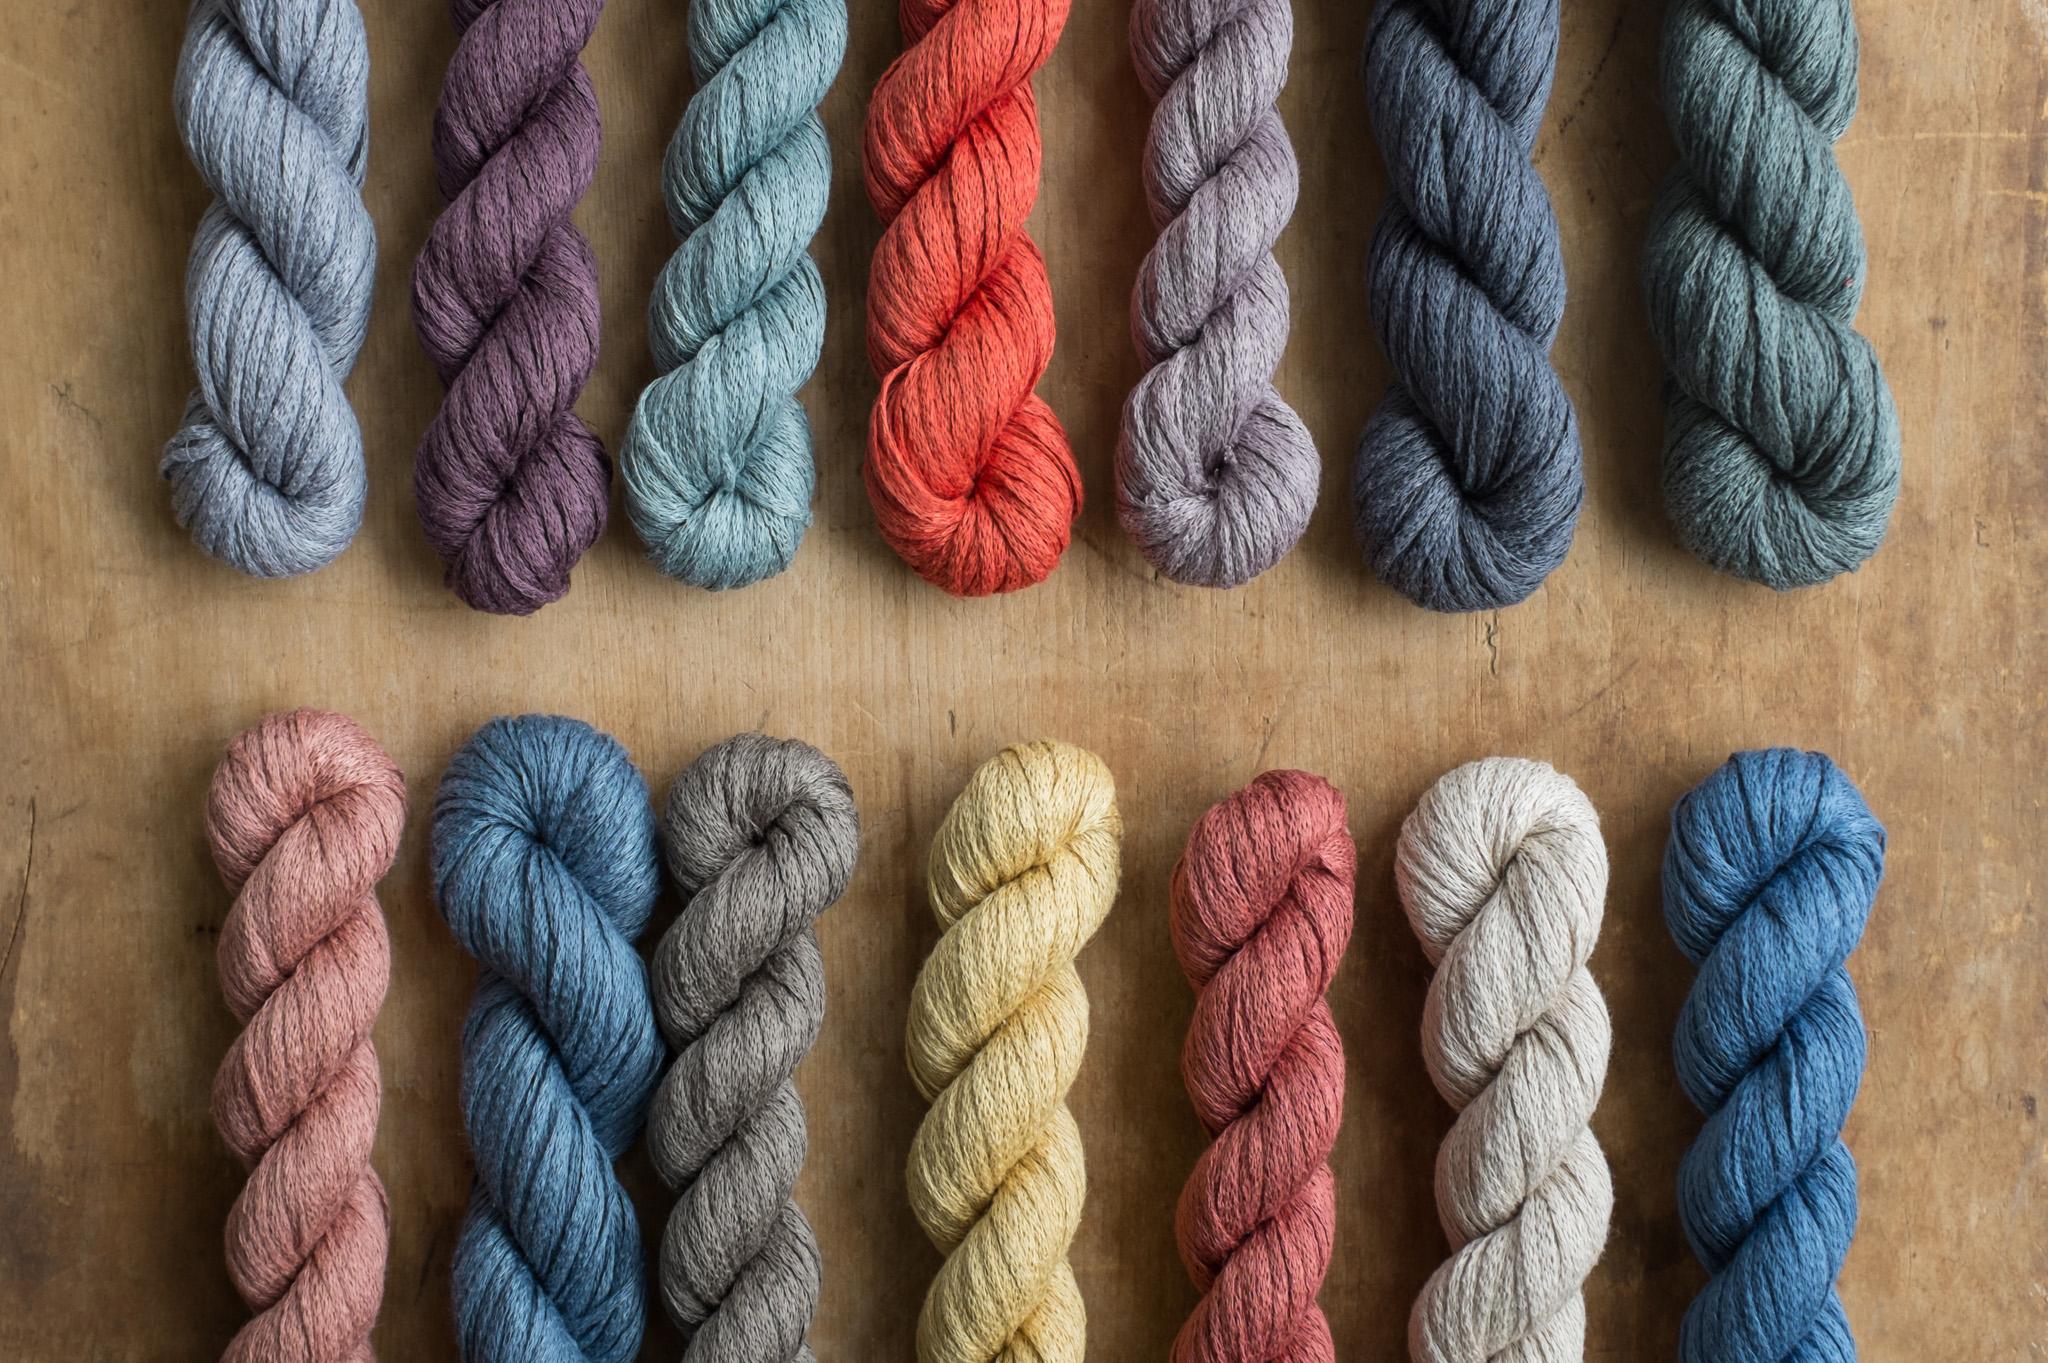 quince-and-co-kestrel-linen-yarn-promo-1.jpg